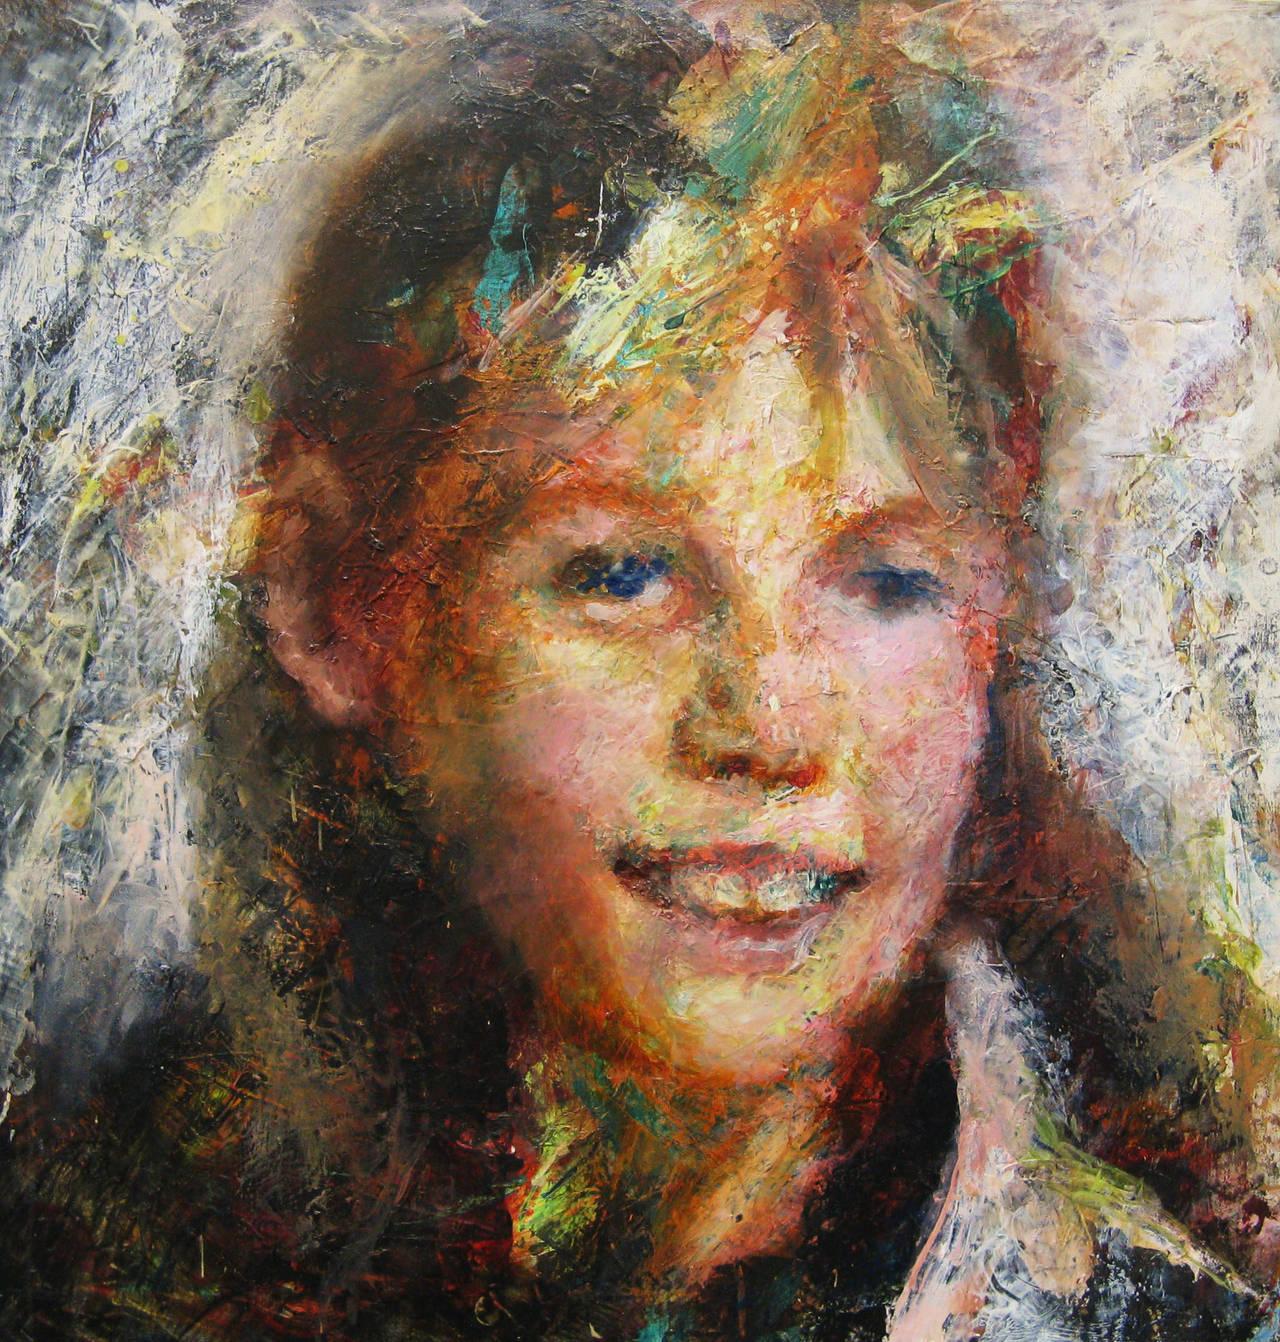 Missing Child Portrait 50 by johnpaulthornton